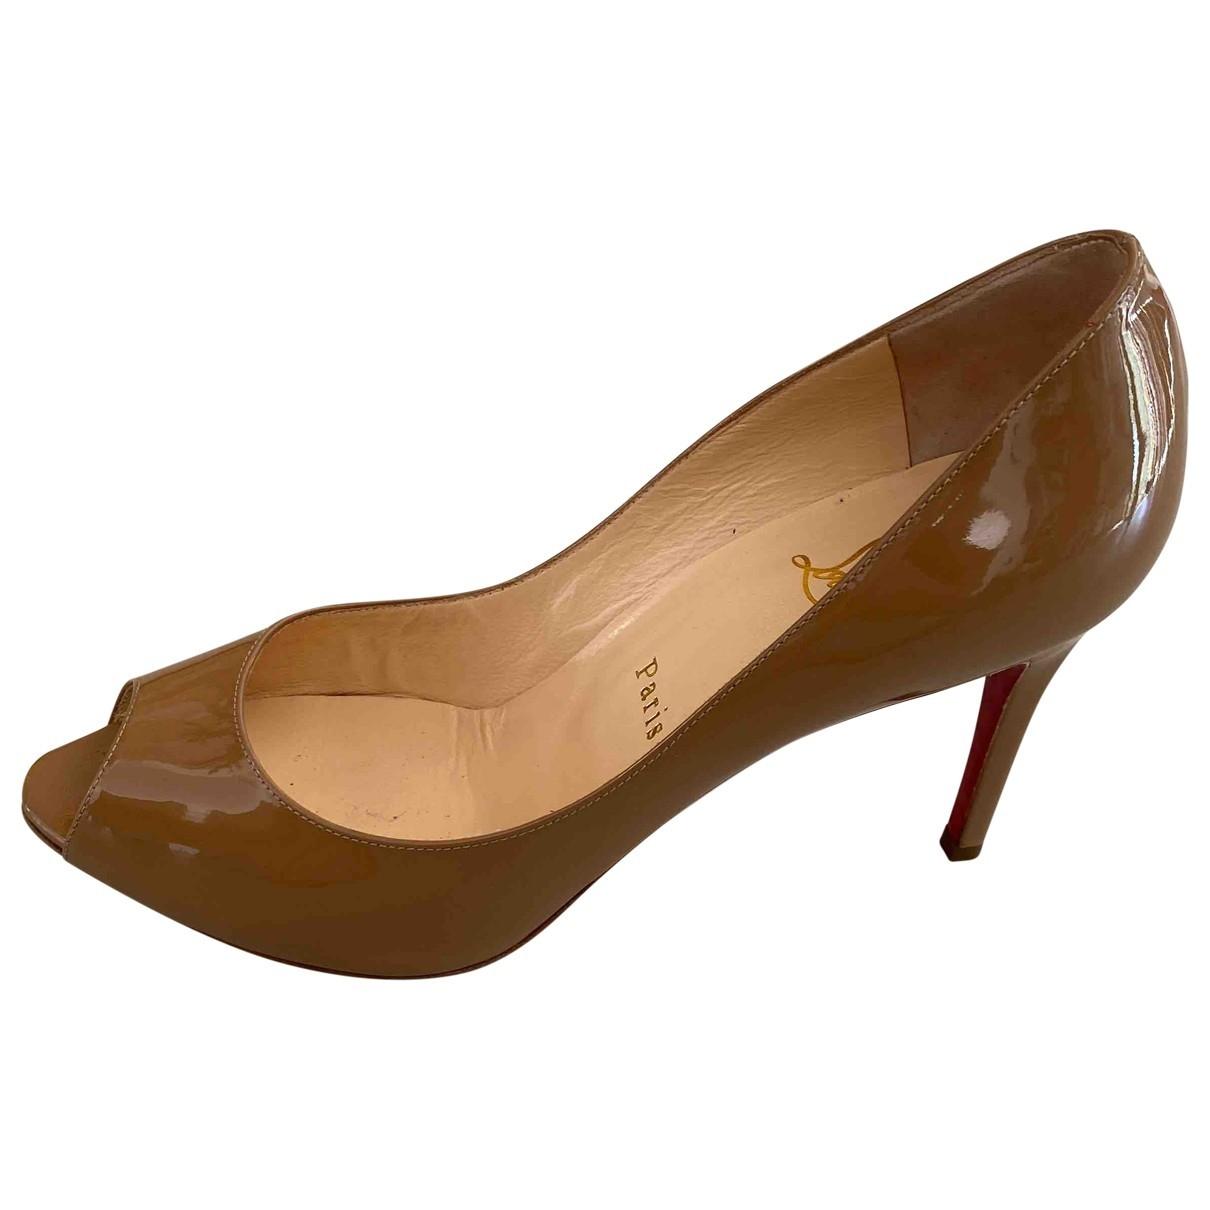 Christian Louboutin \N Beige Patent leather Heels for Women 39.5 EU